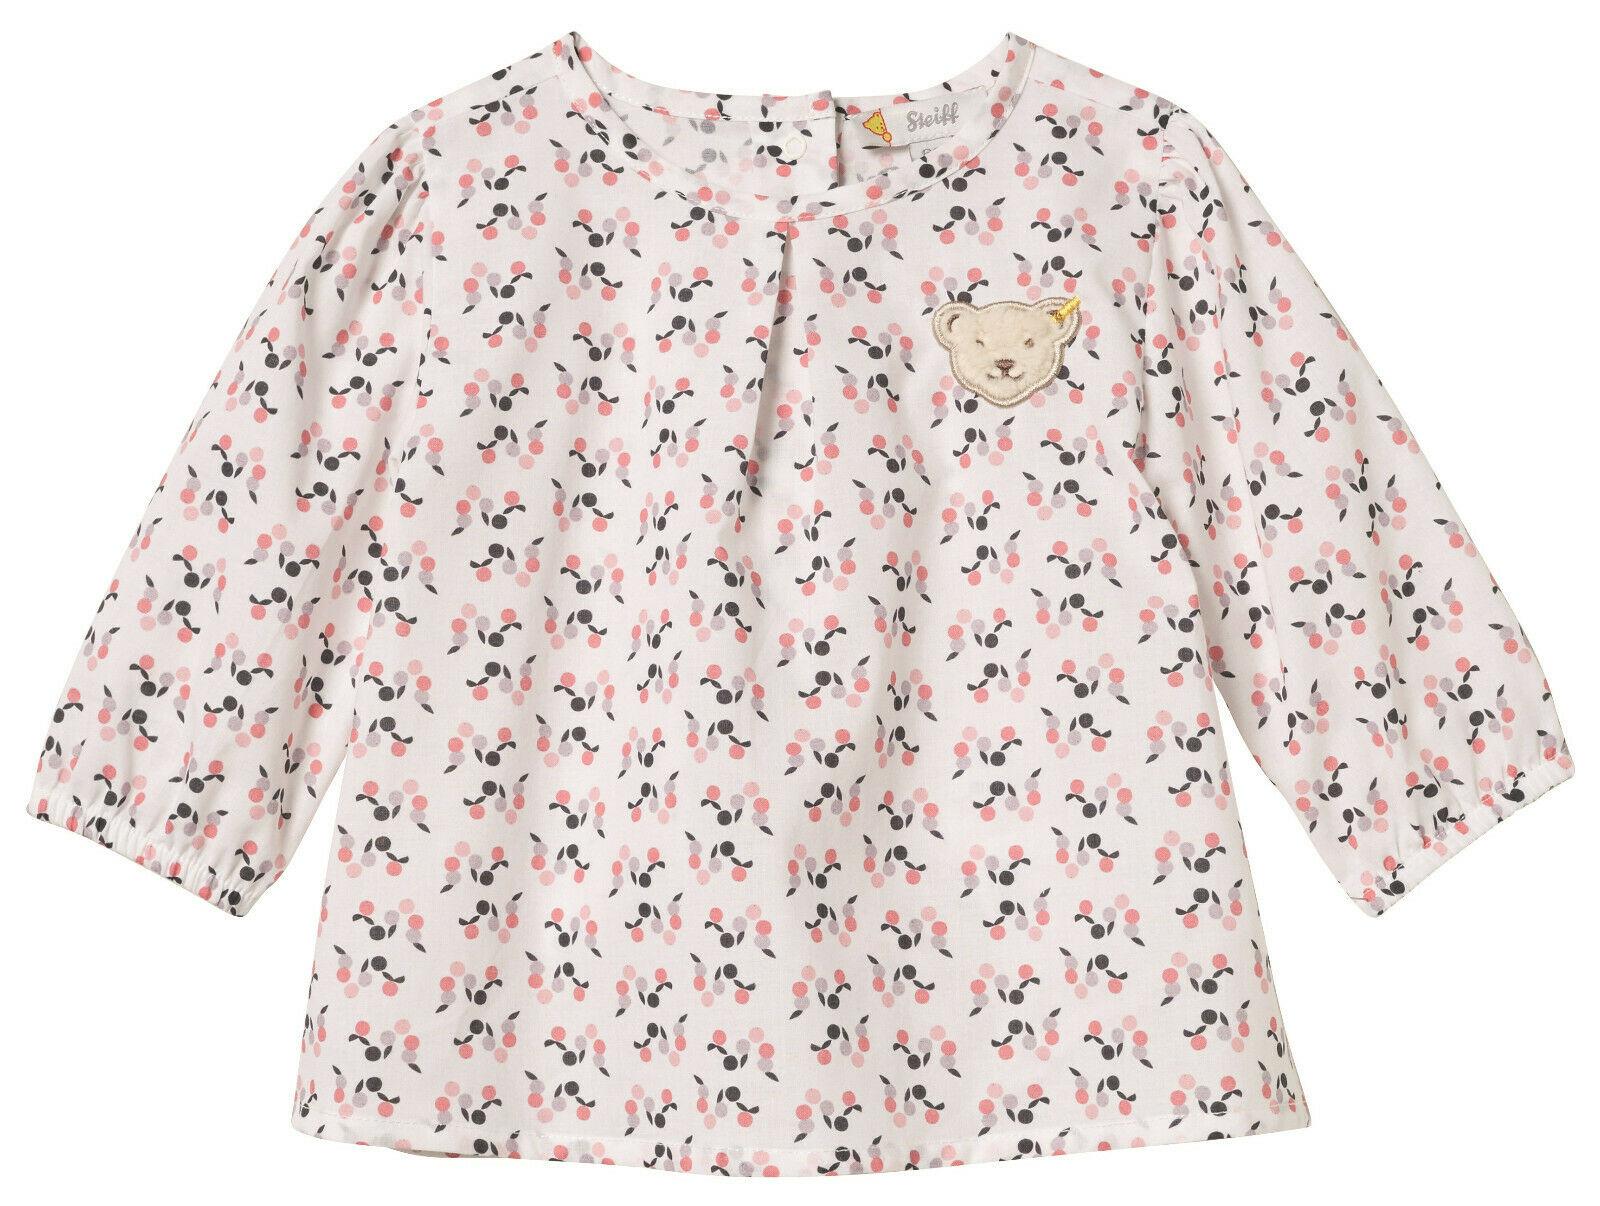 Baby Mädchen Pullover Langarmshirt Shirt Tunika Bluse  AUSWAHL  50-86  NEU